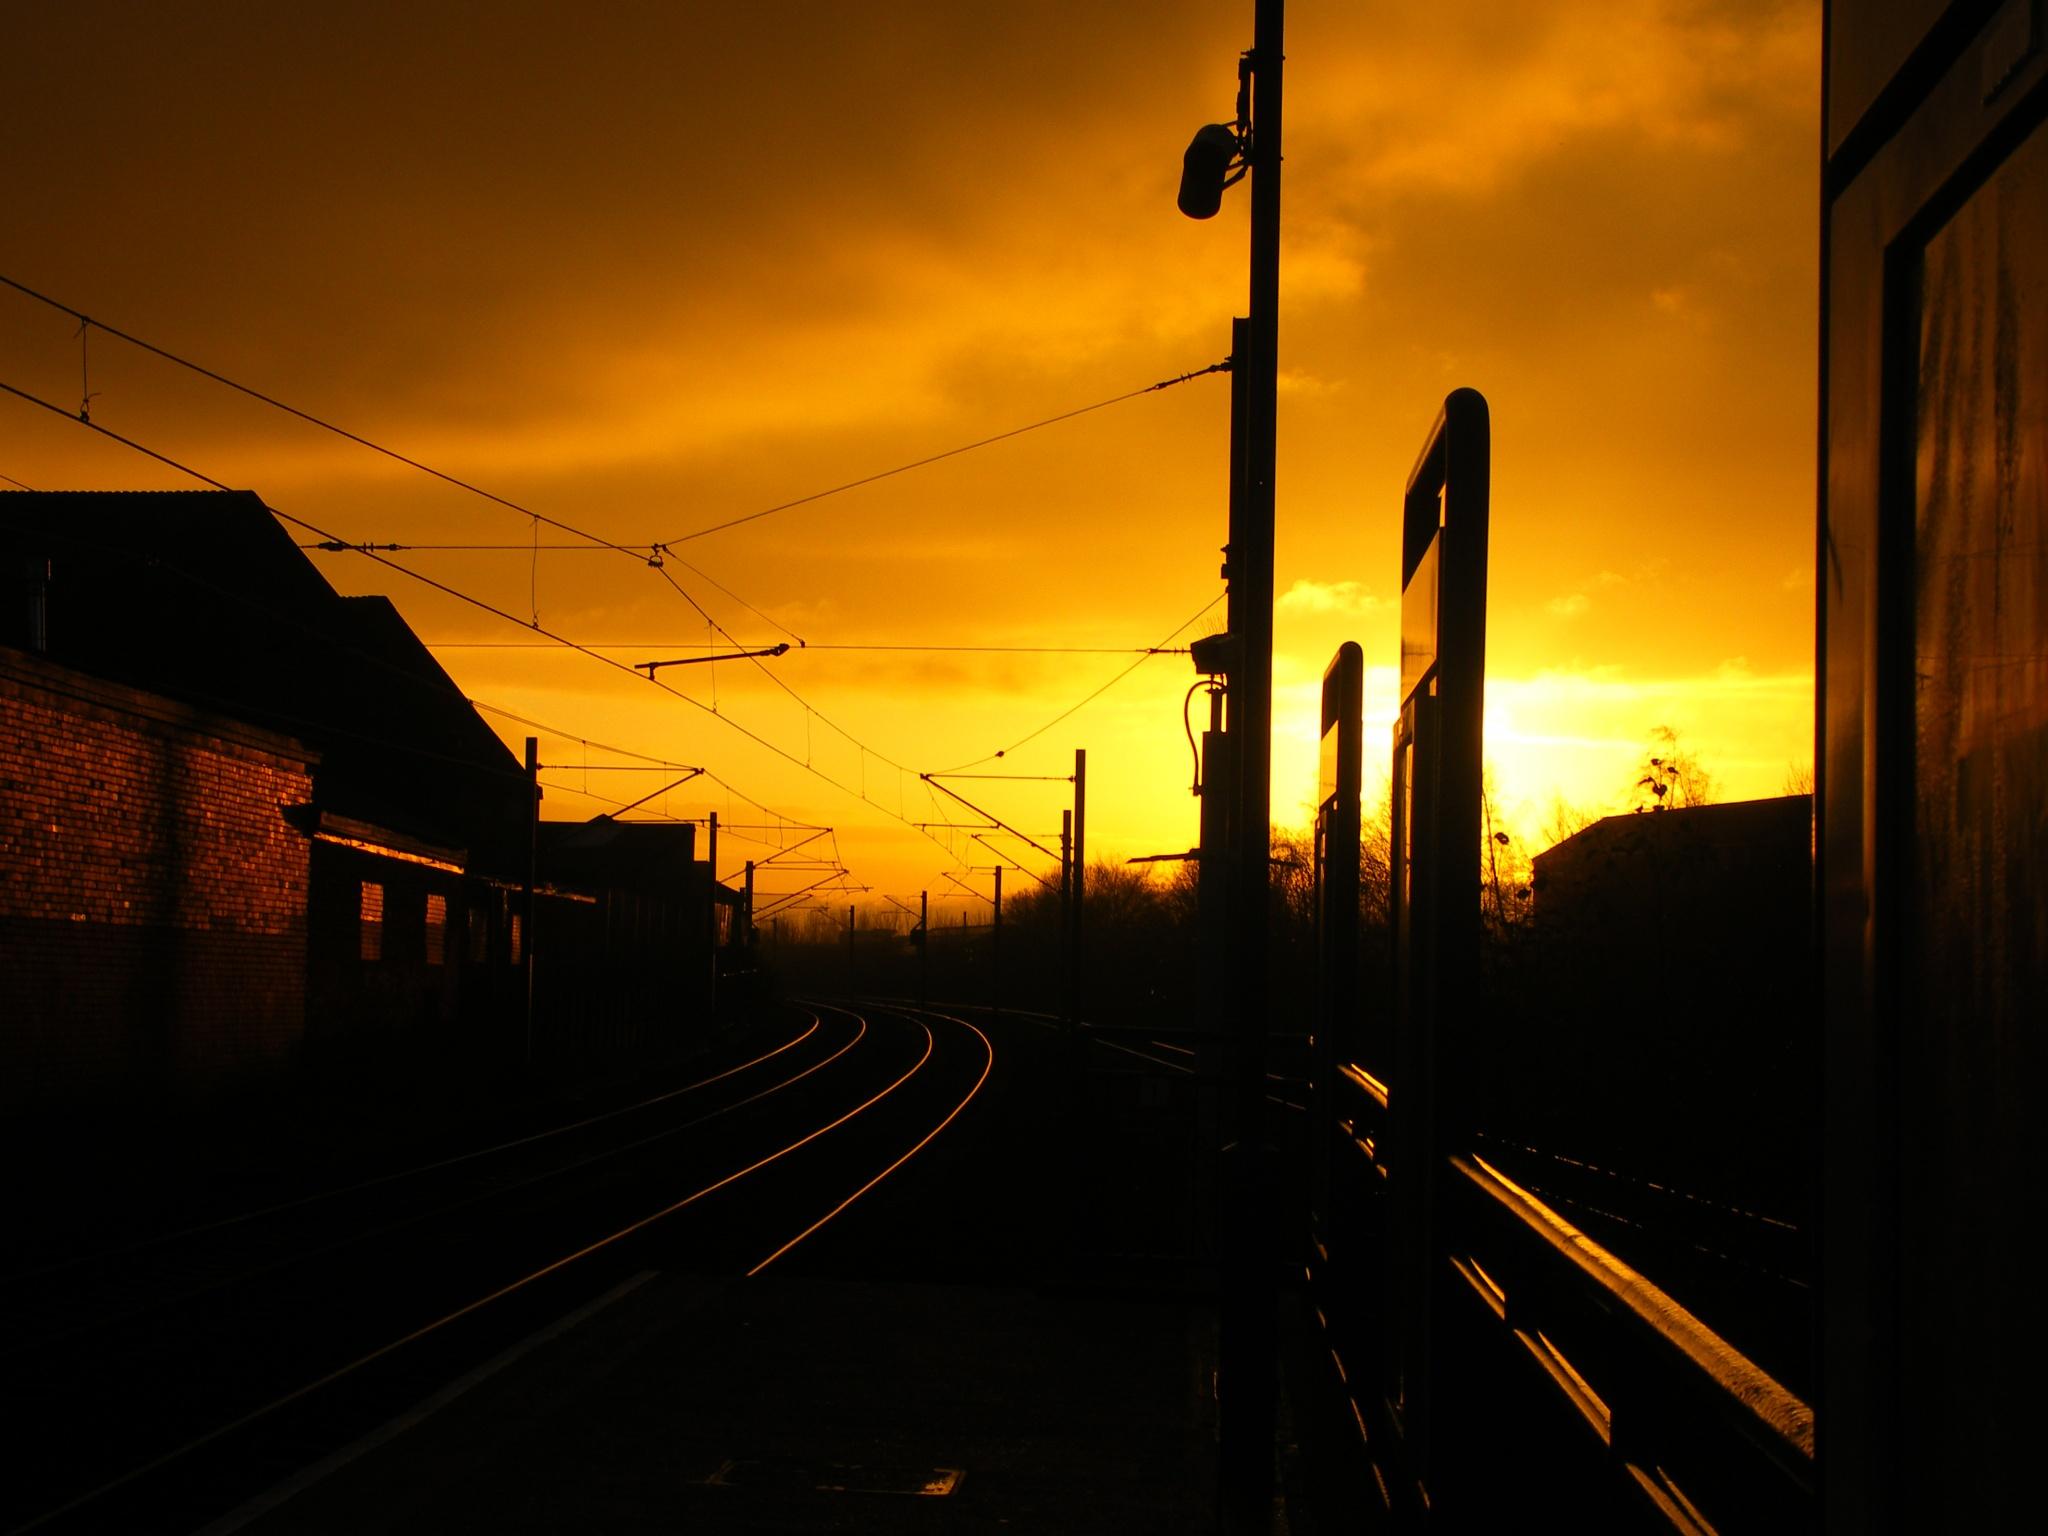 Metro Sunset by bunts45